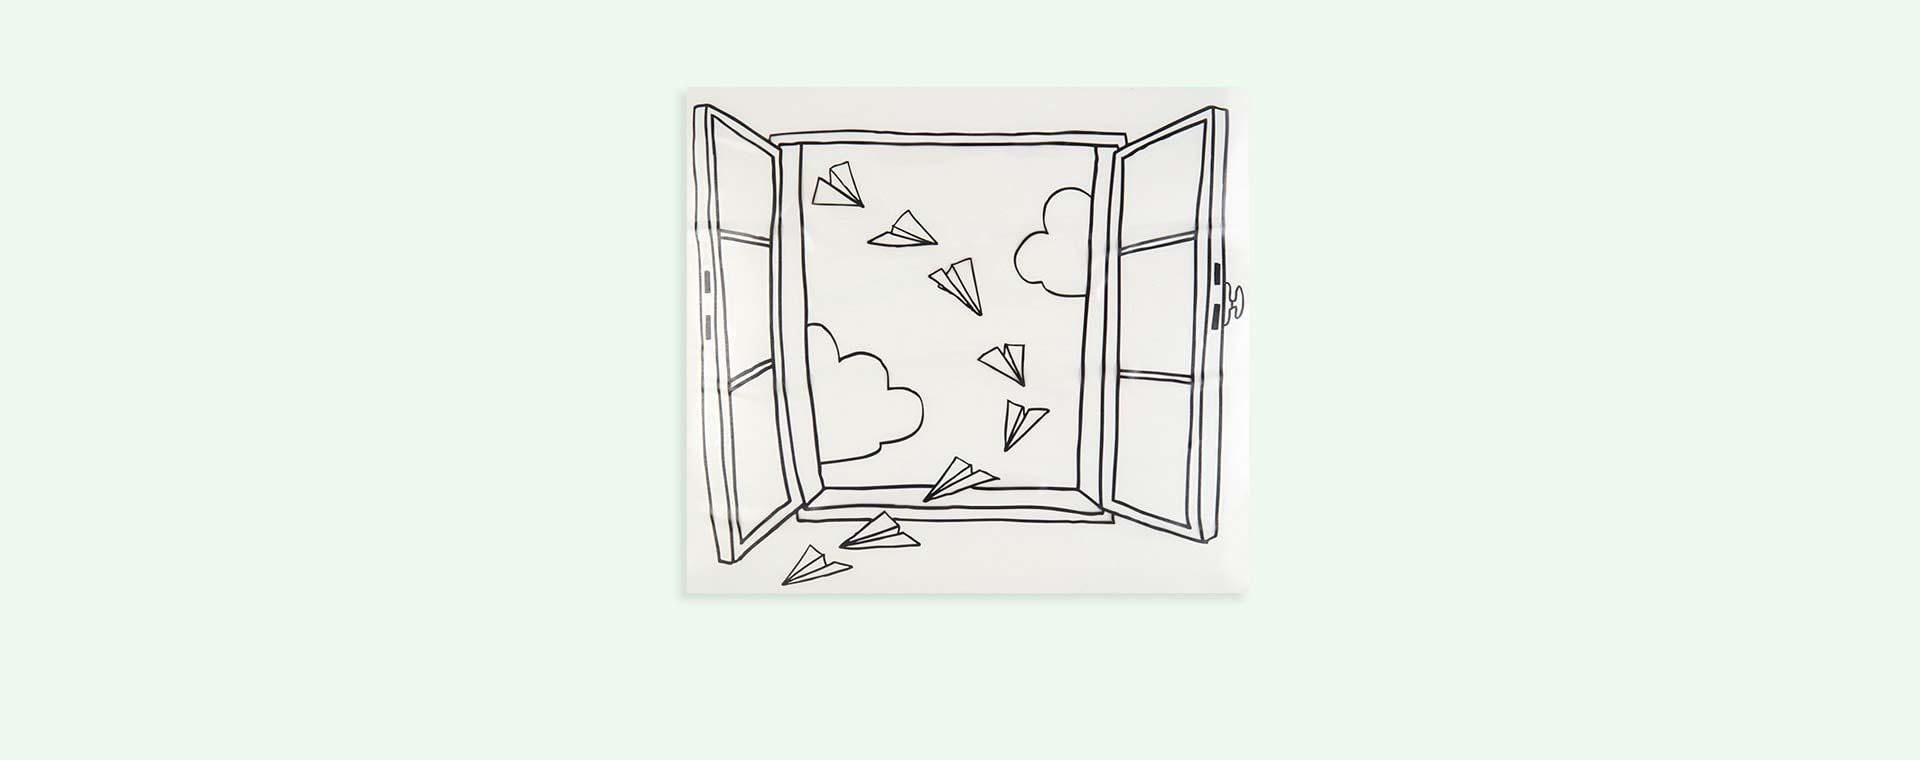 Black Chispum Planes Window Wall Sticker